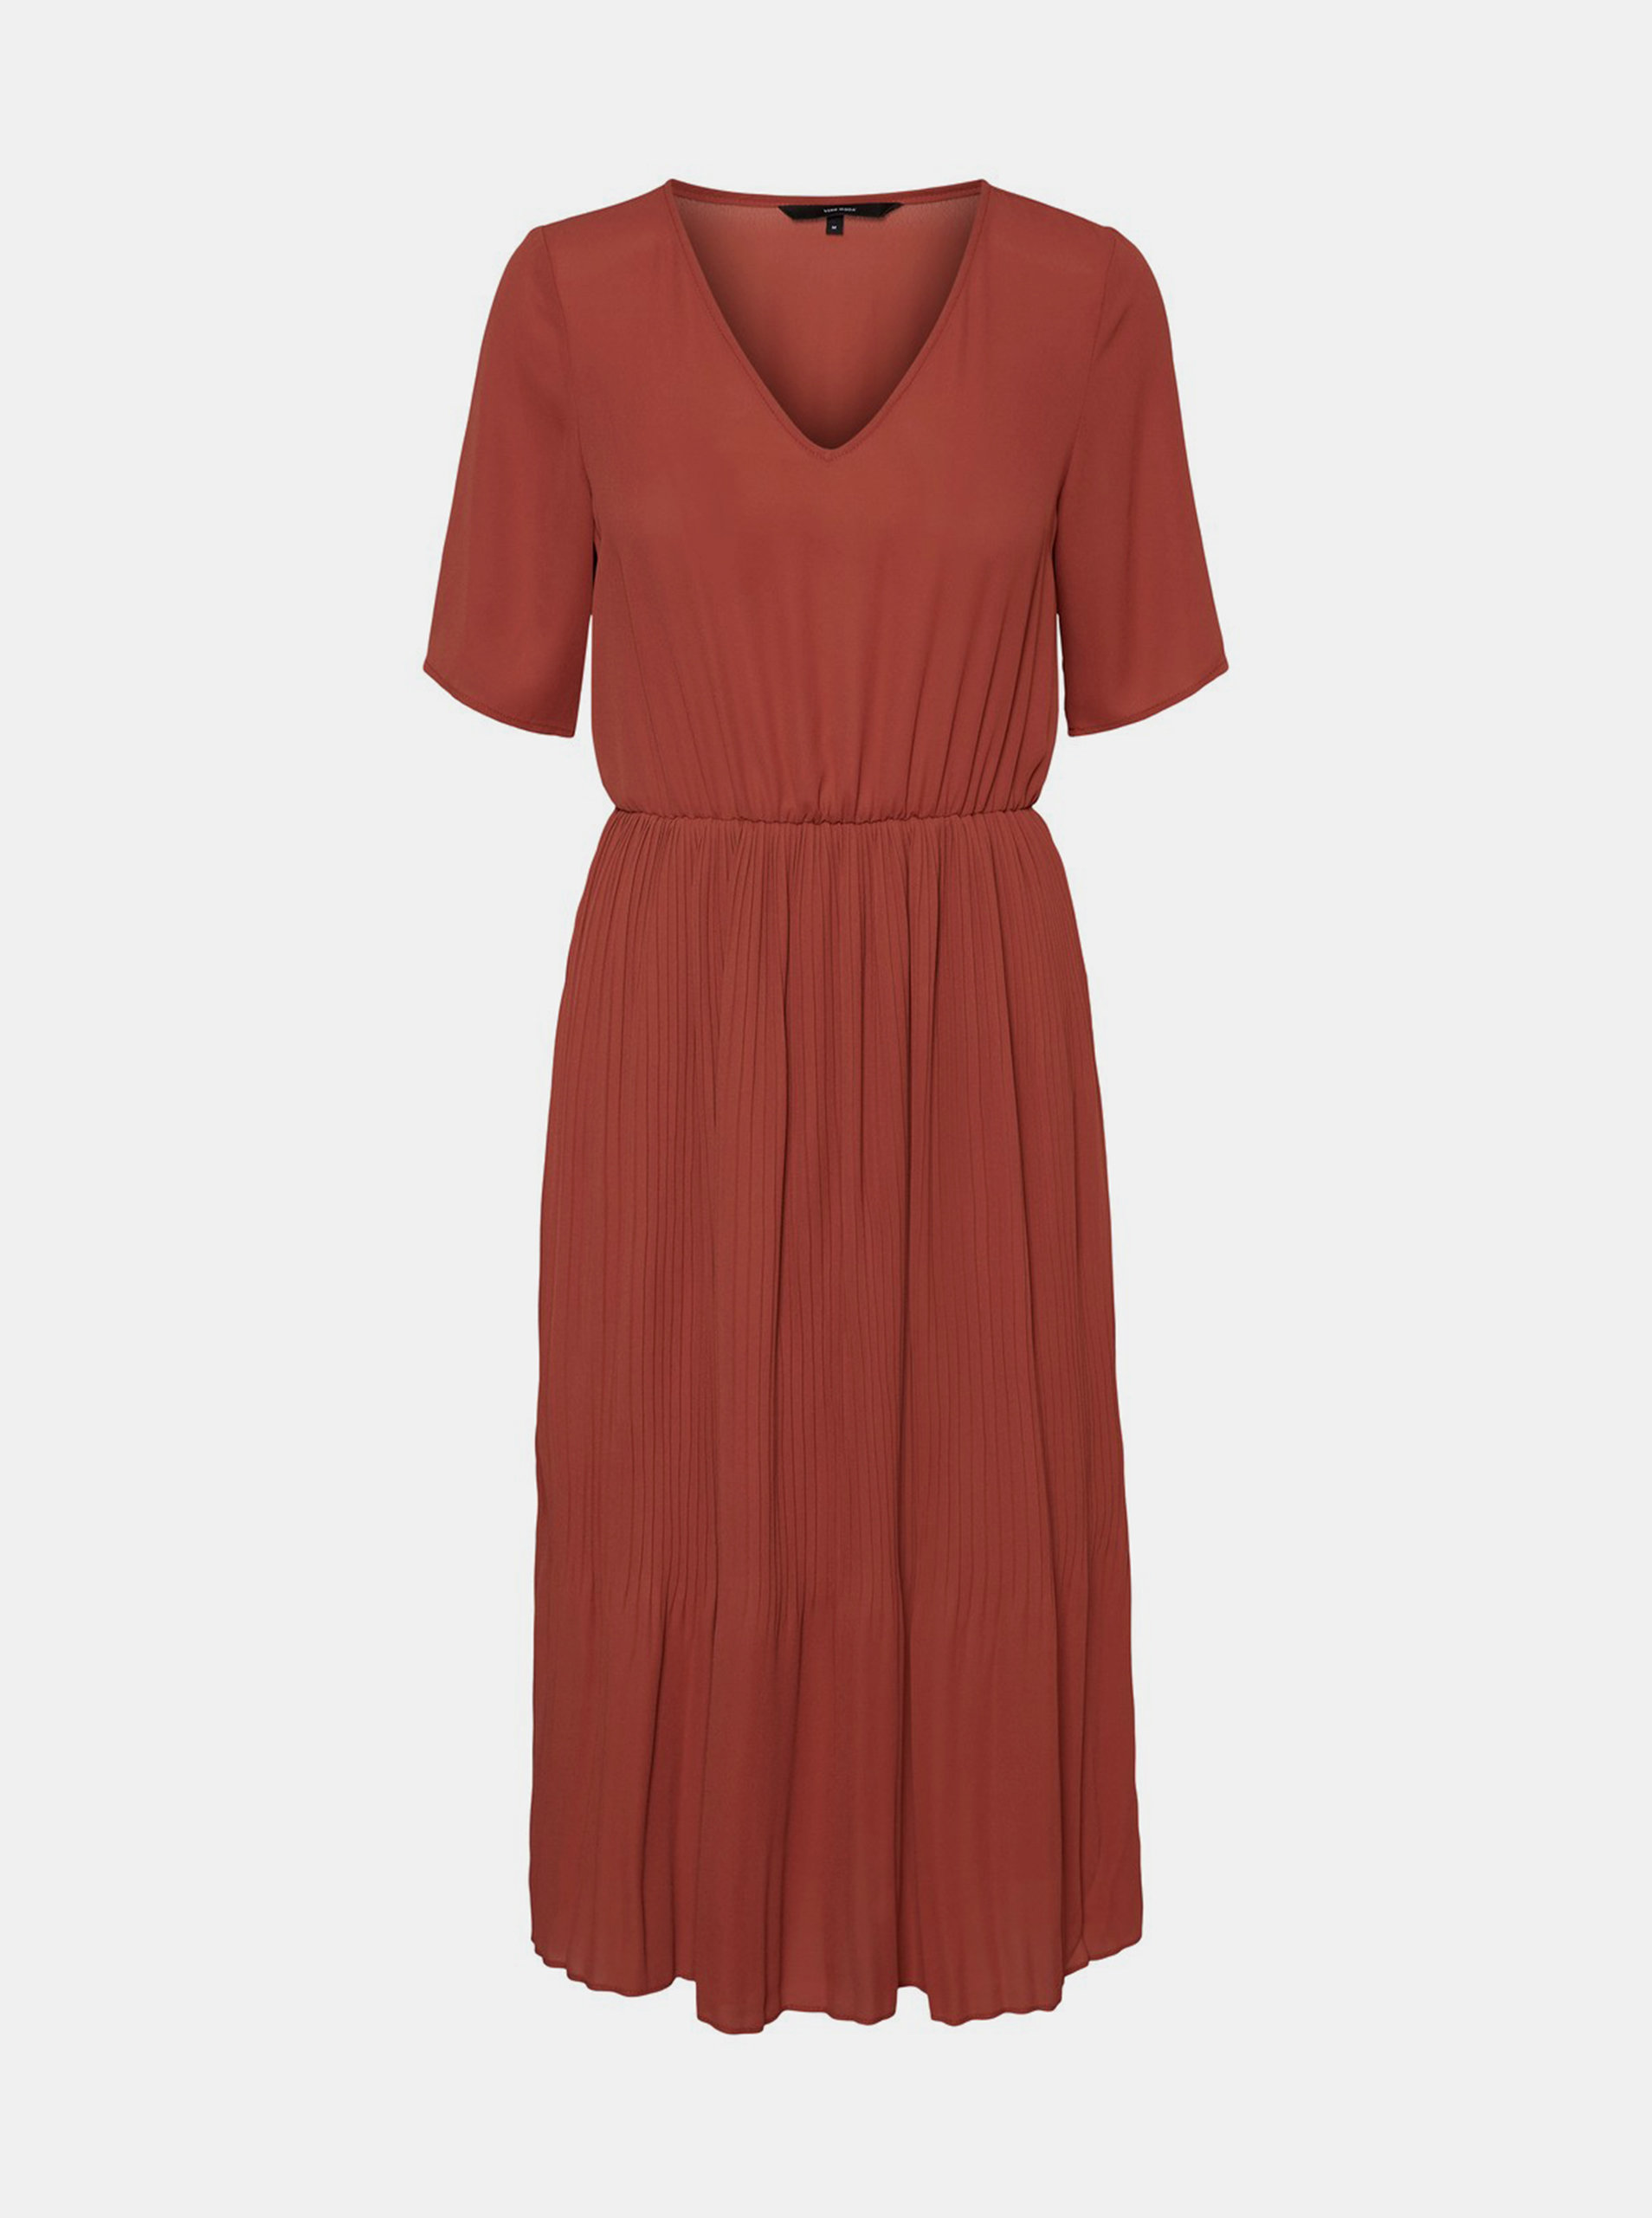 Fotografie Hnědé midišaty s plisovanou sukní VERO MODA Malou